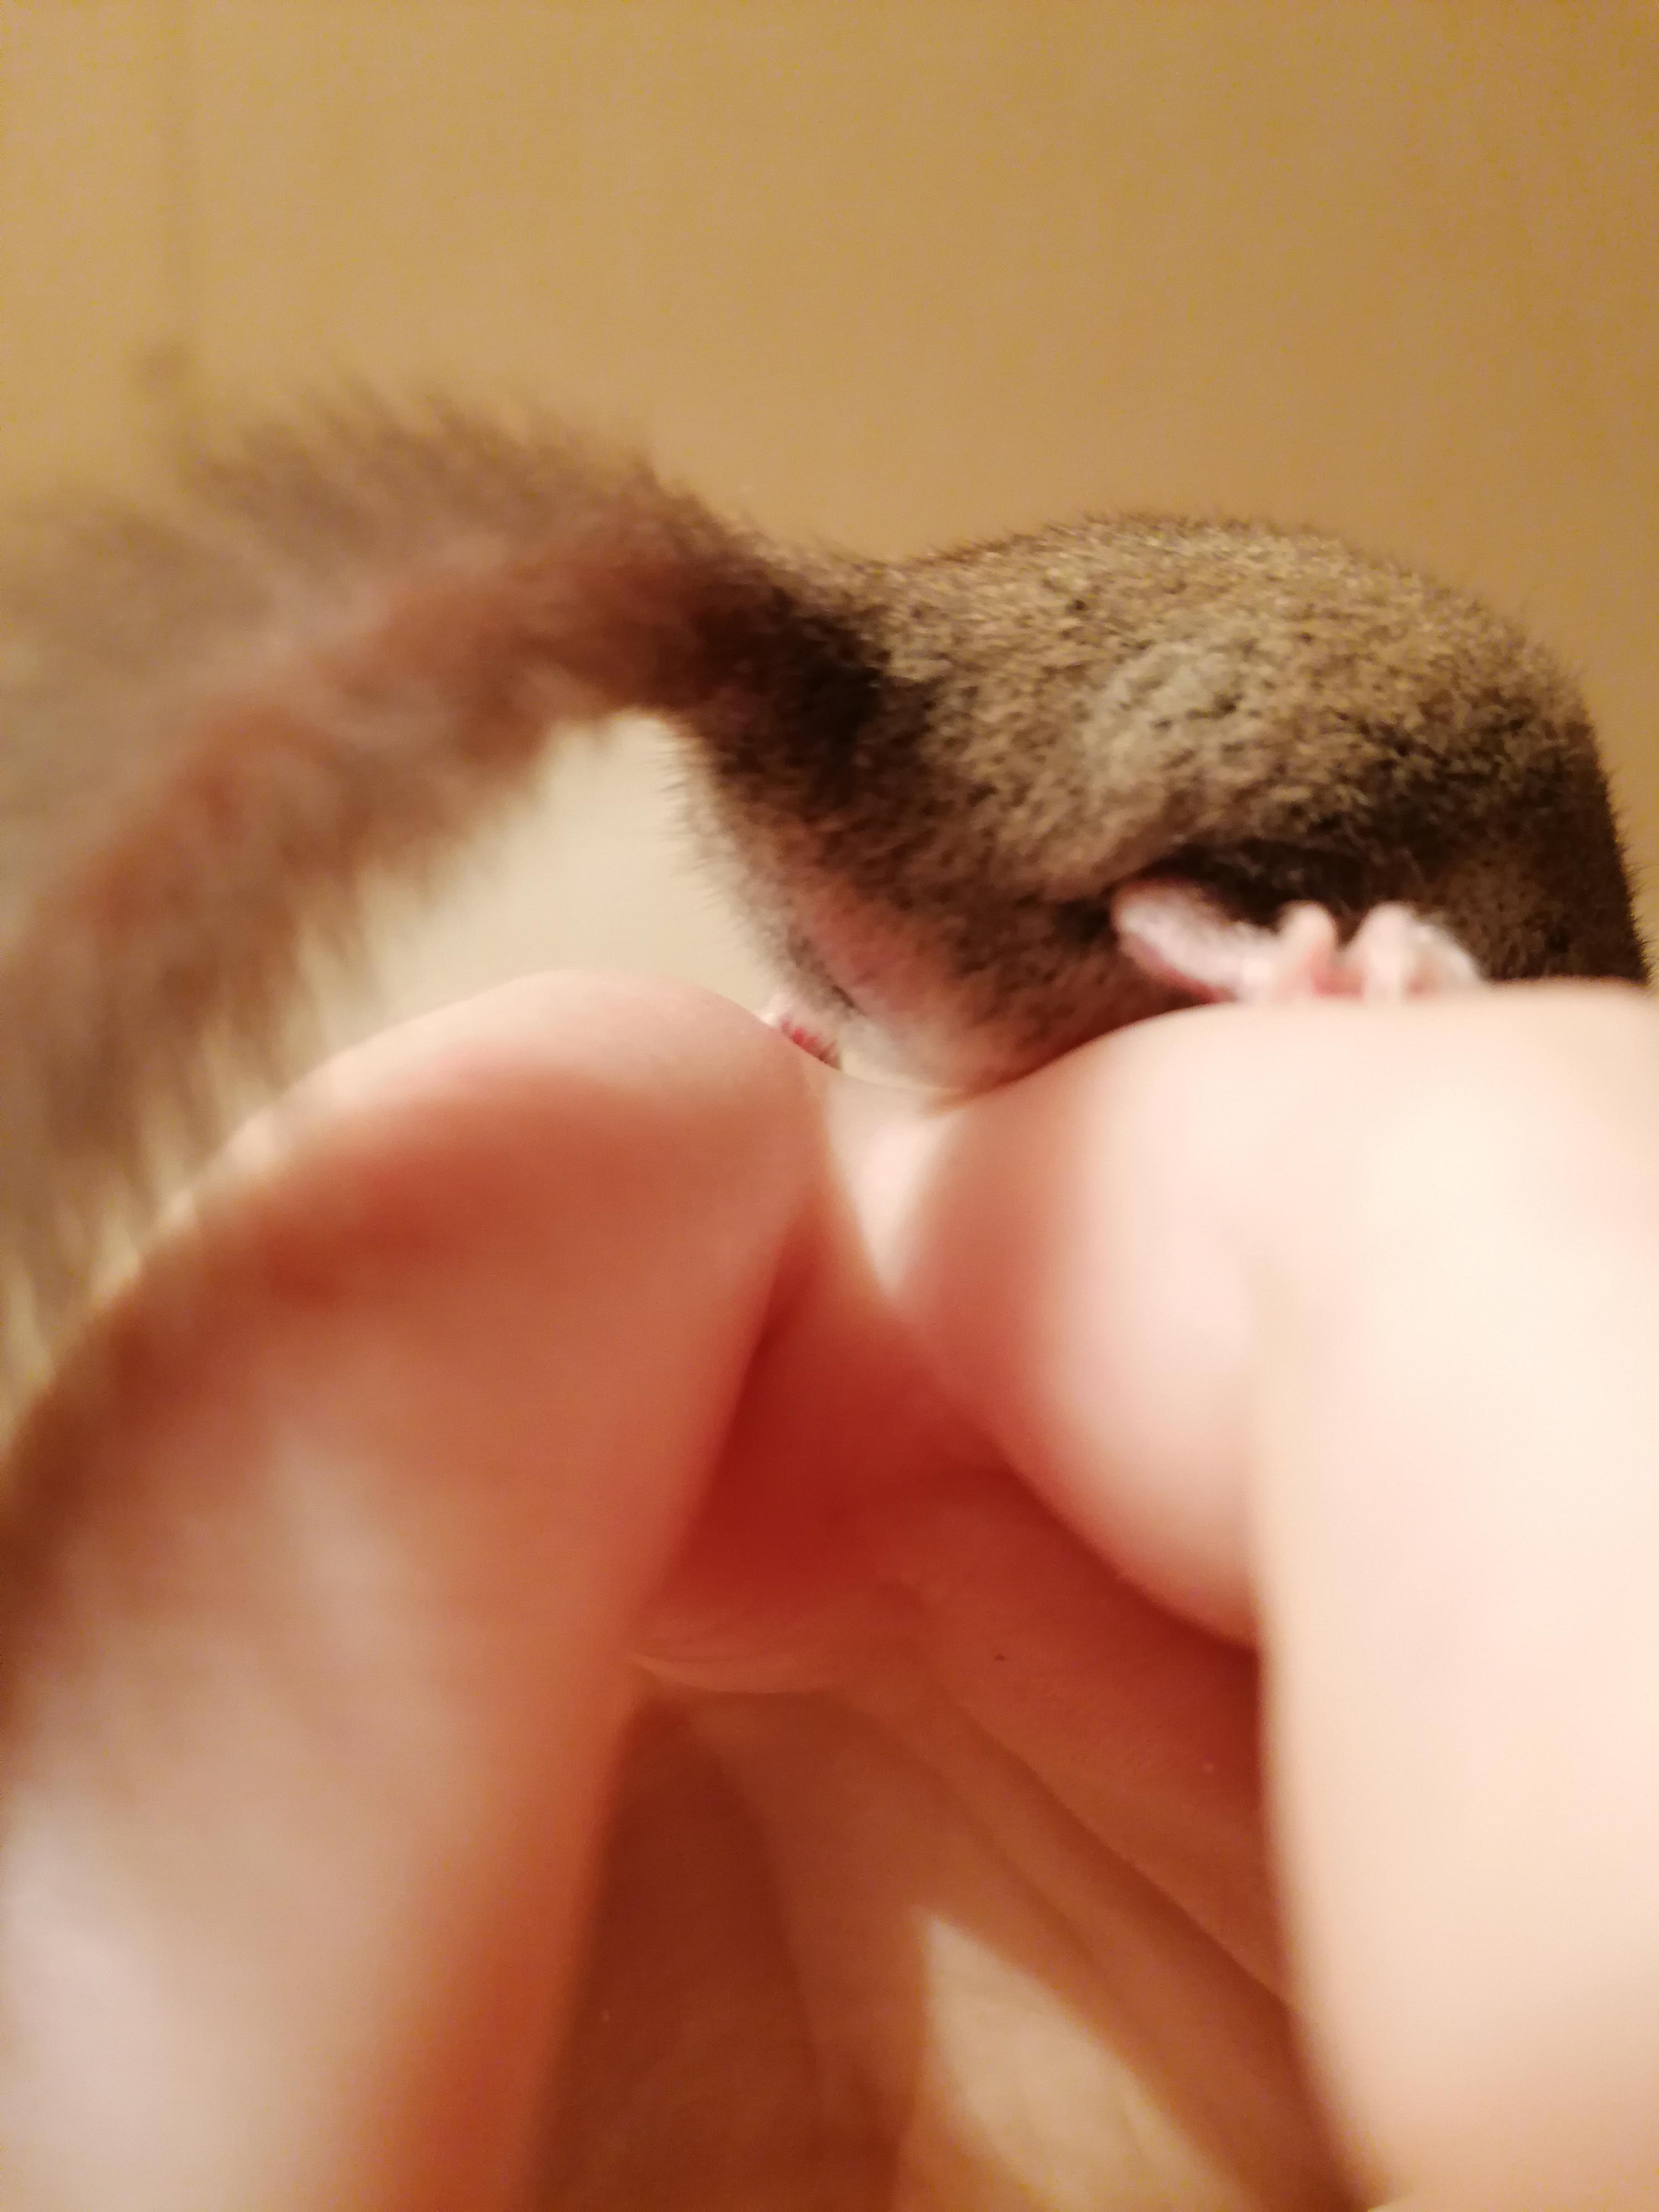 Sexing micro squirrel-img_20200817_000000_1597659667588.jpg